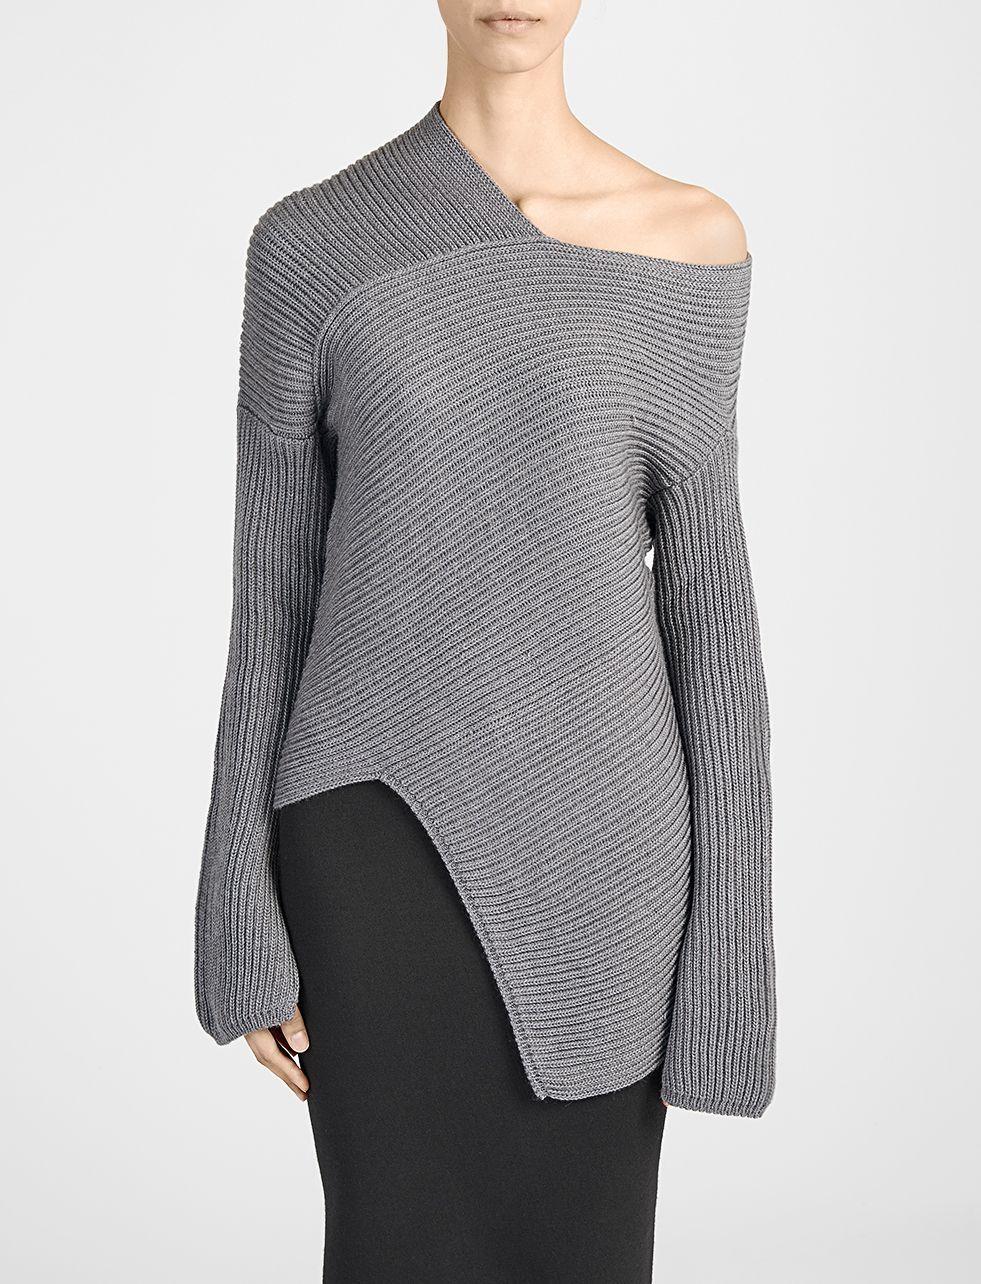 32429838aeaa Wool Cardigan Stitch Asymmetric Sweater alternative image